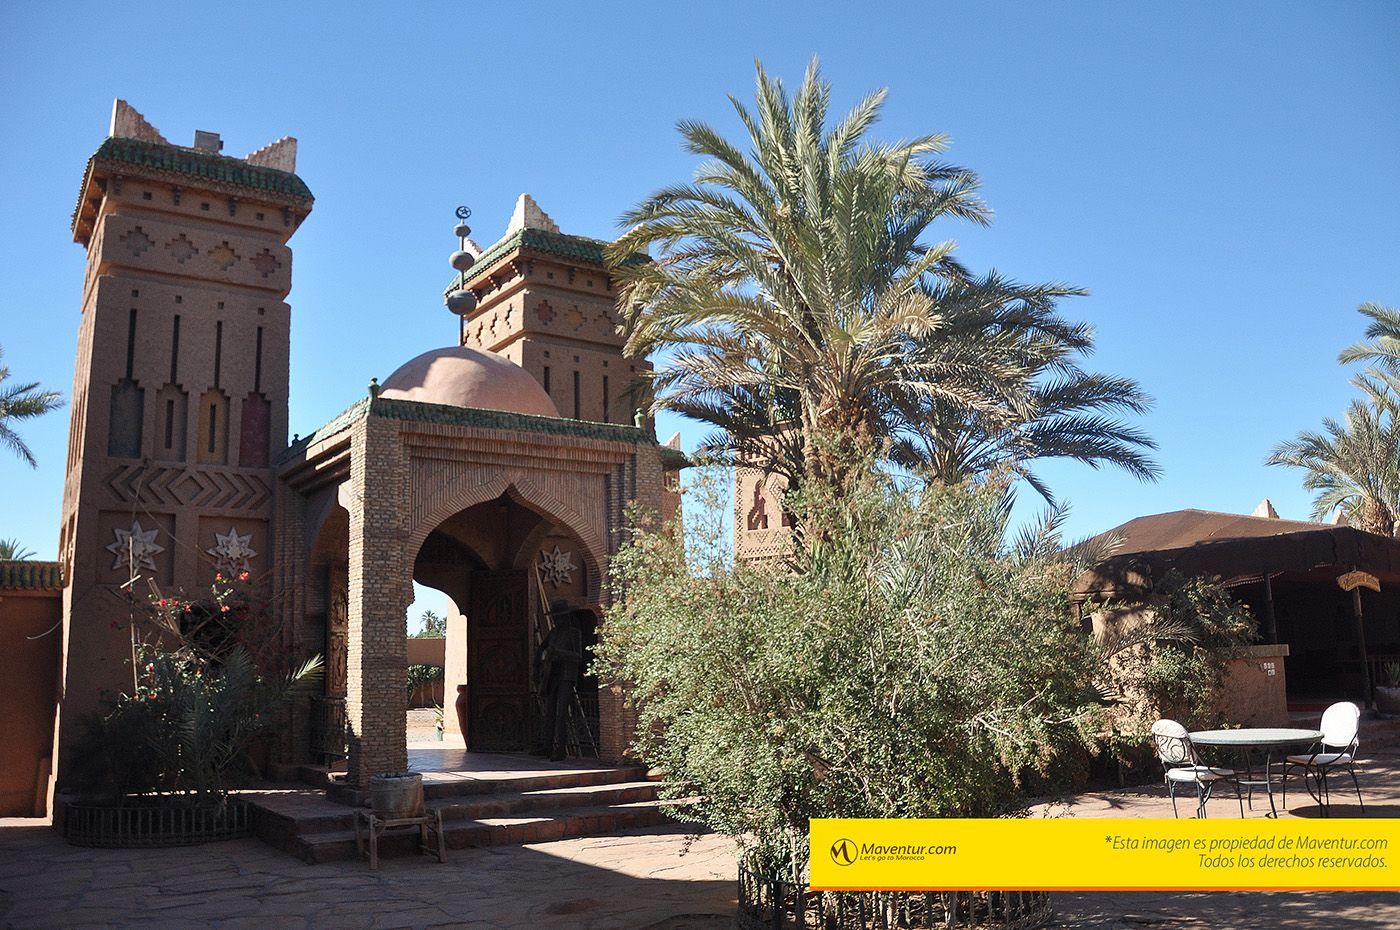 chez-lepacha-mhamid-zagora-desert-desierto-hotel-kasbah-maventur-lujo-hoteles